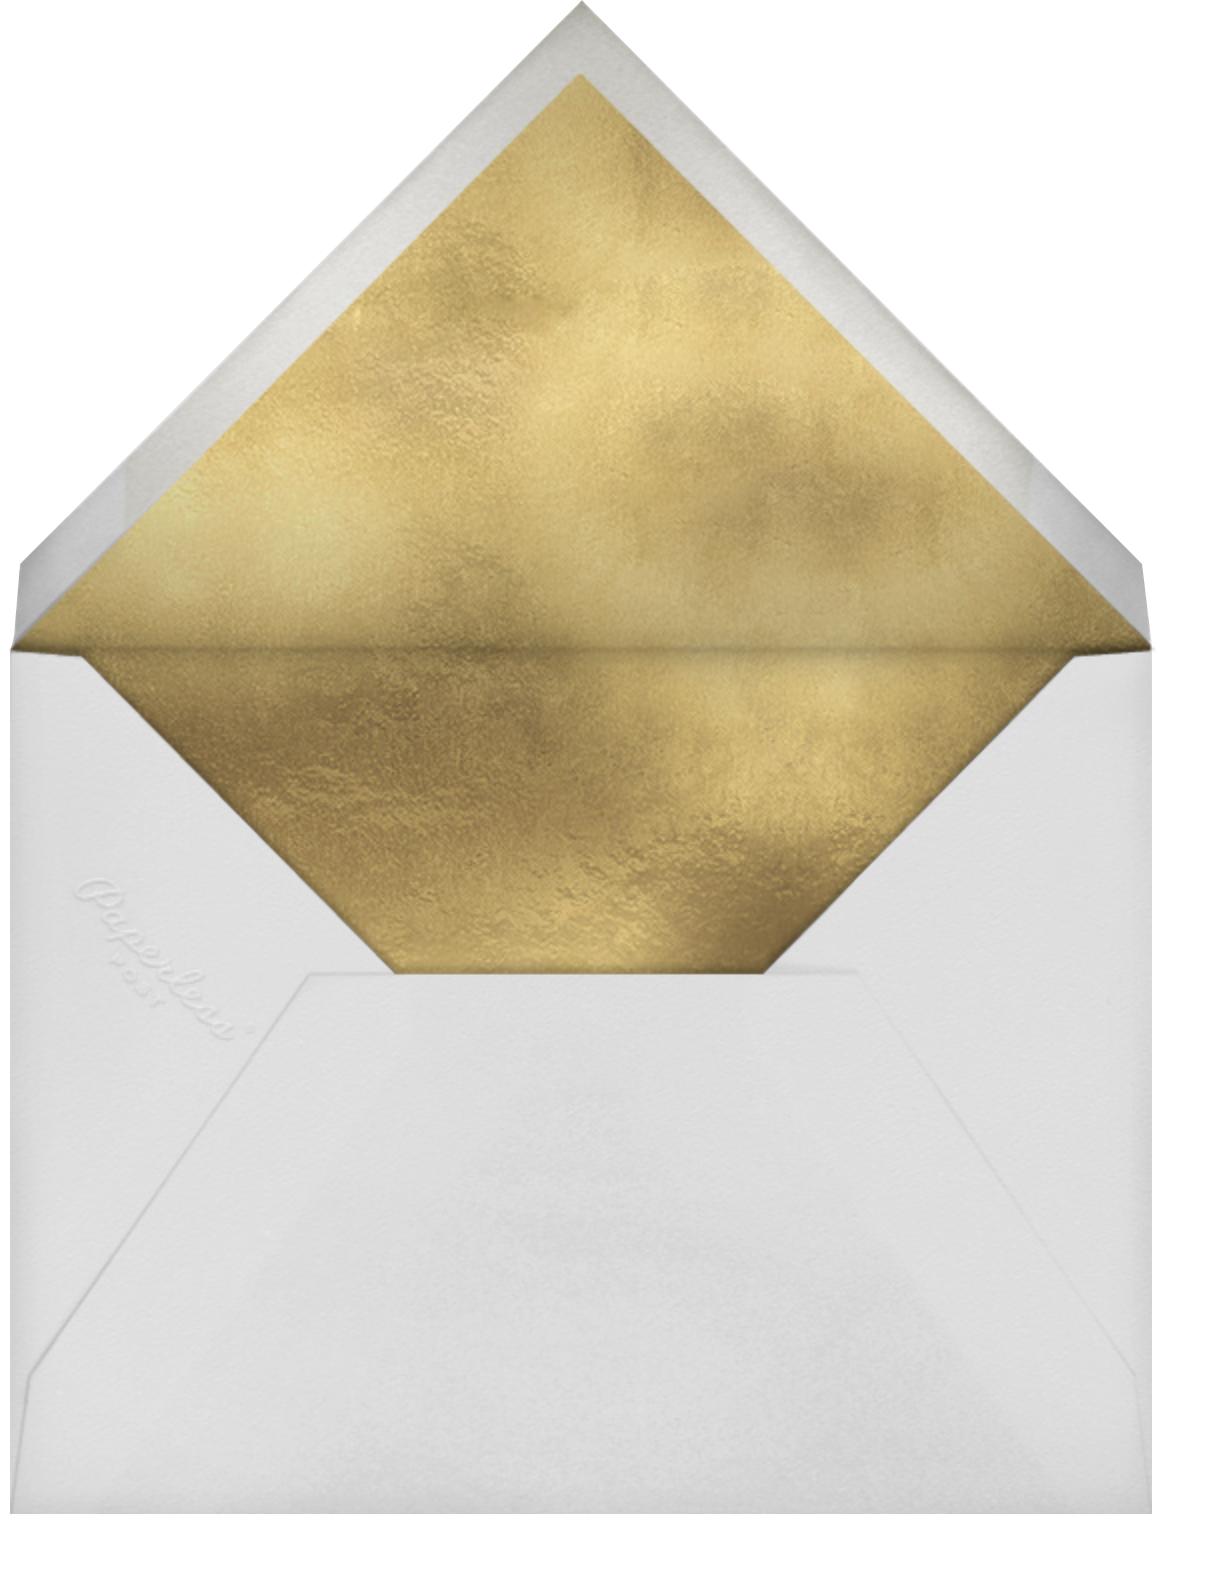 Good Sounds - Black - kate spade new york - Envelope